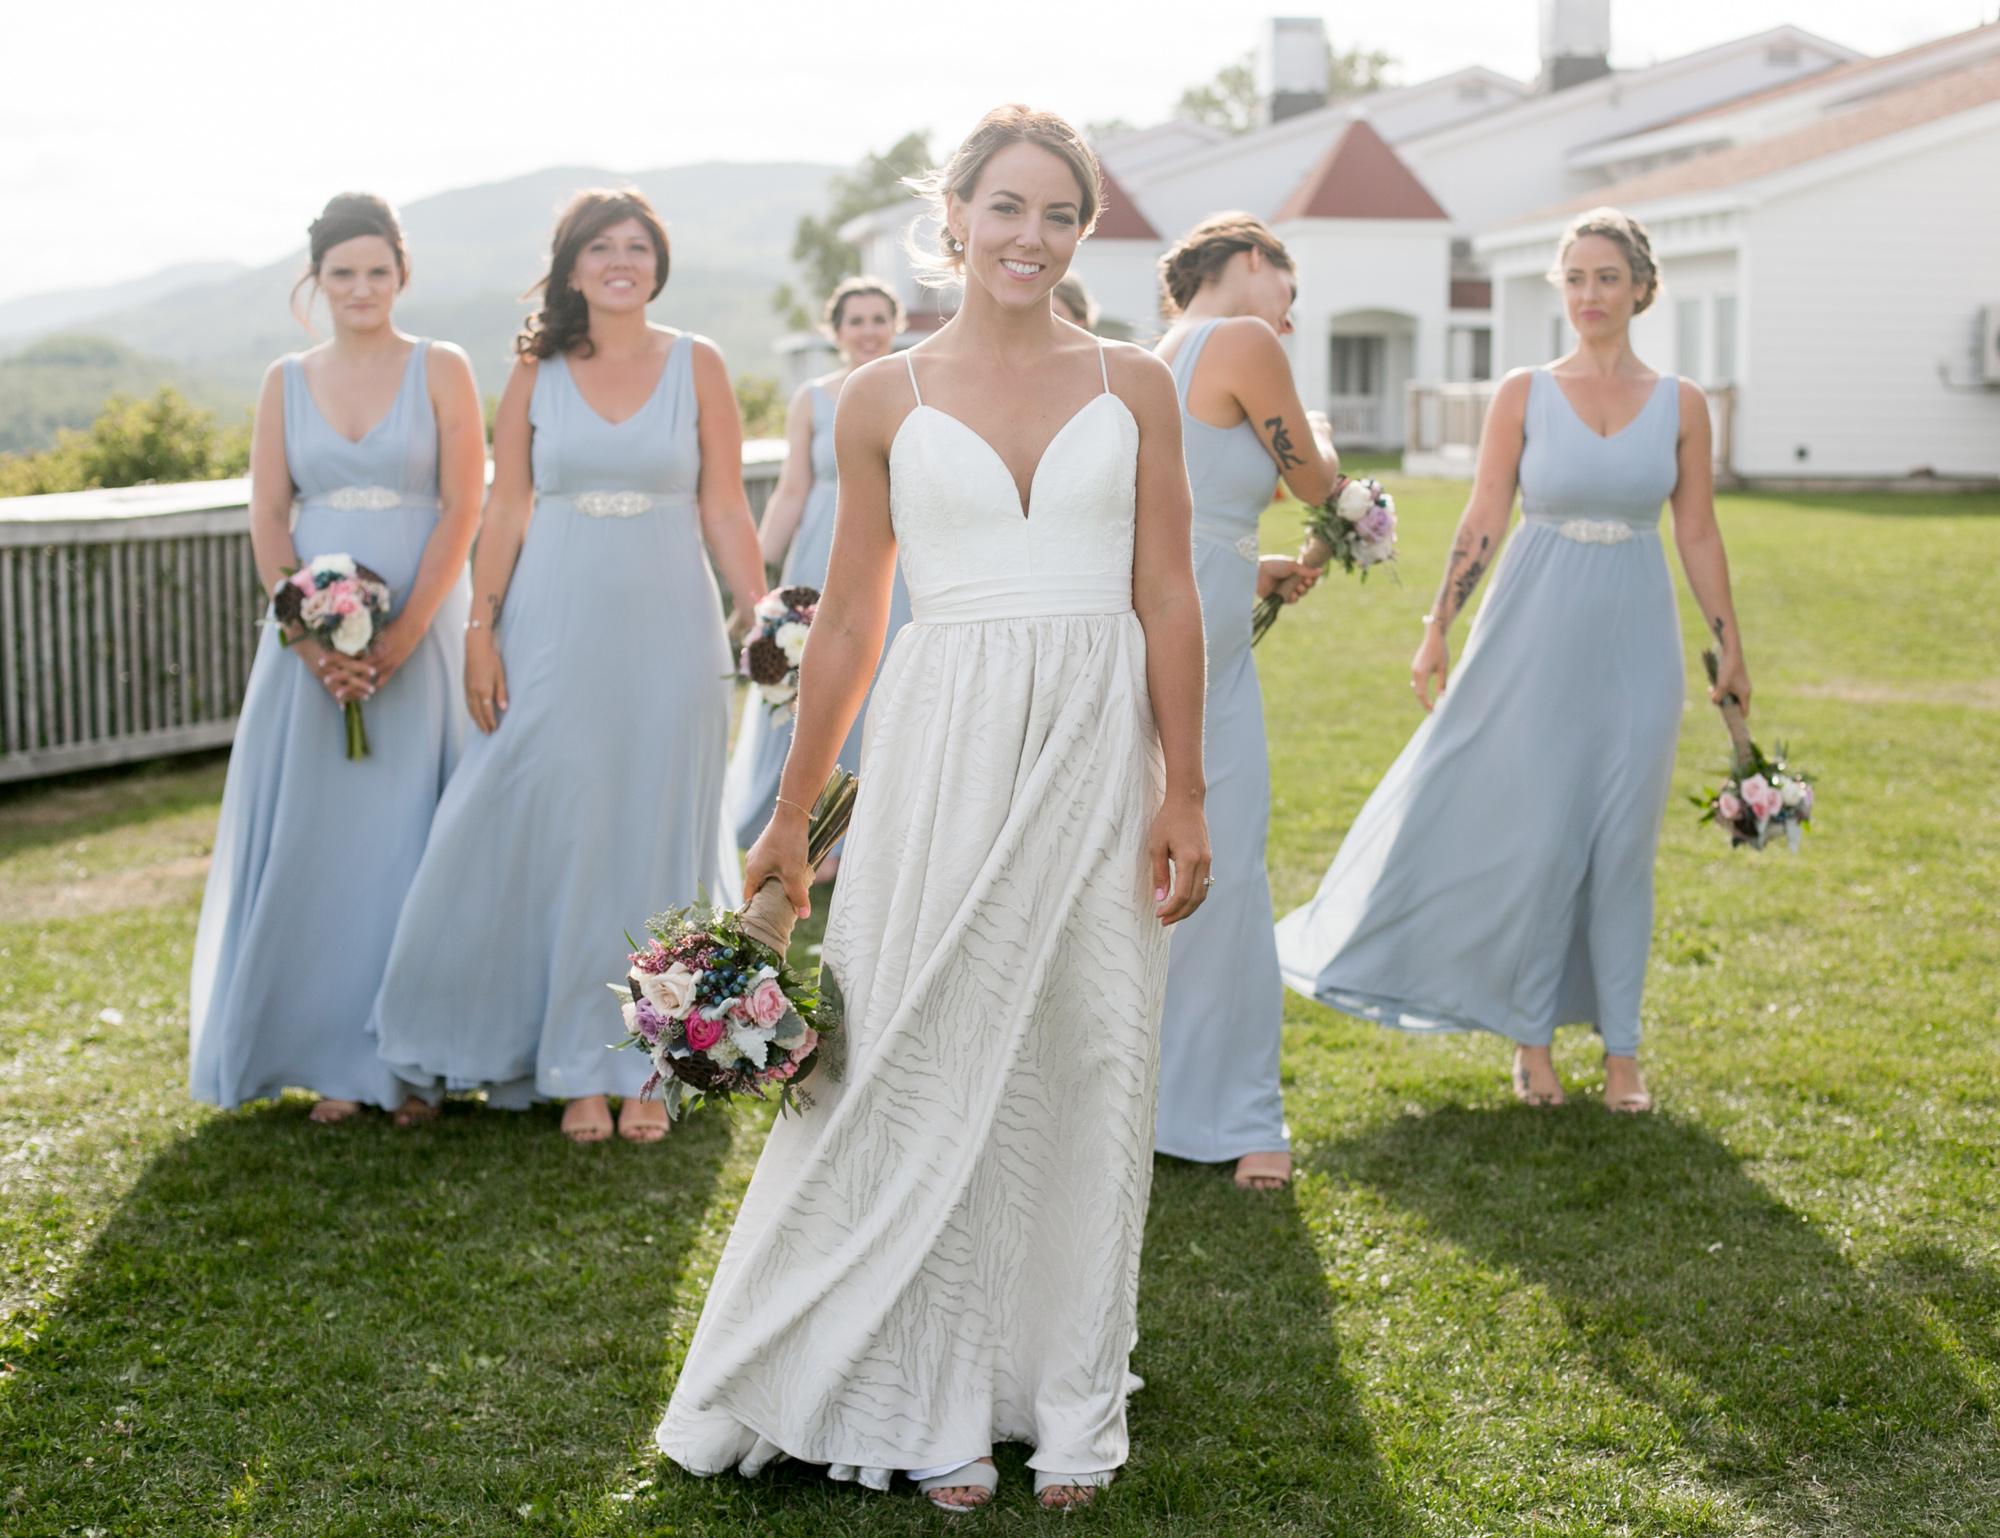 109-keltic-lodge-wedding-.jpg